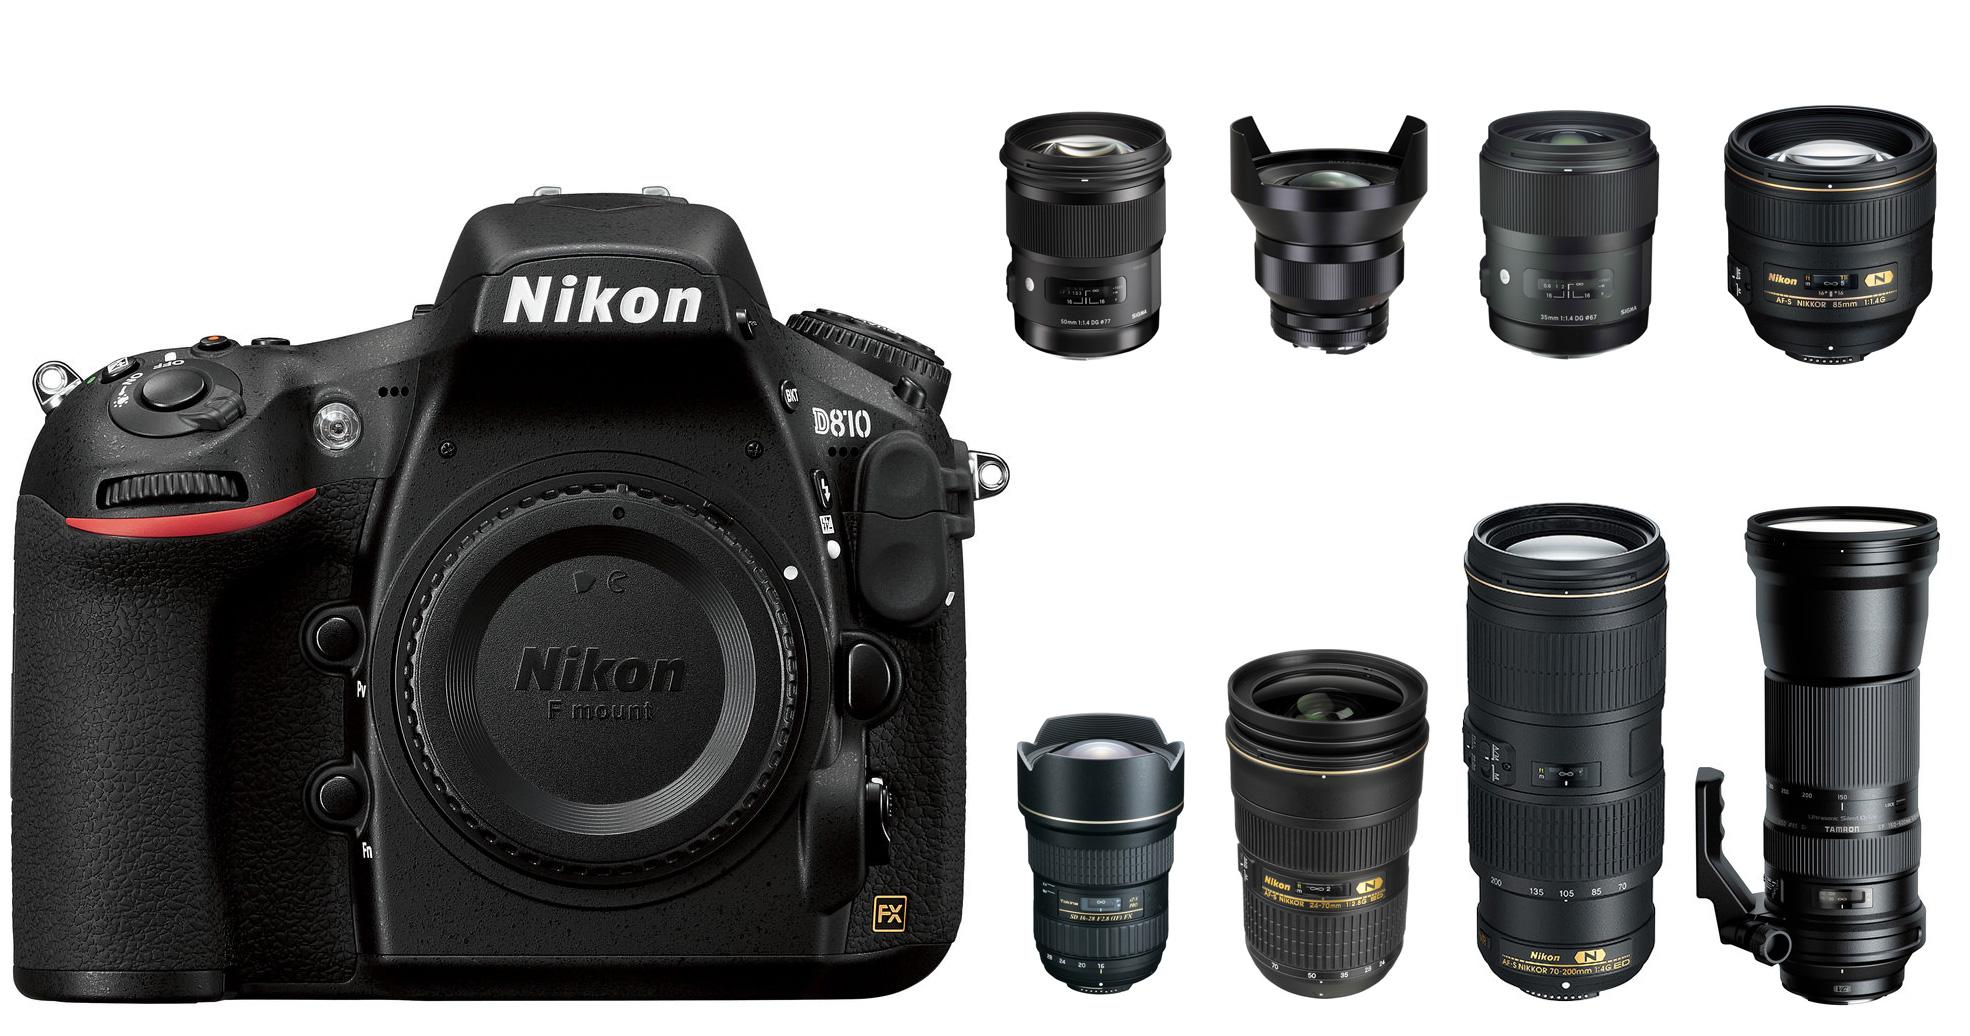 Camera New Nikon Dslr Cameras 2014 for nikon lenses images guru d lense lenses